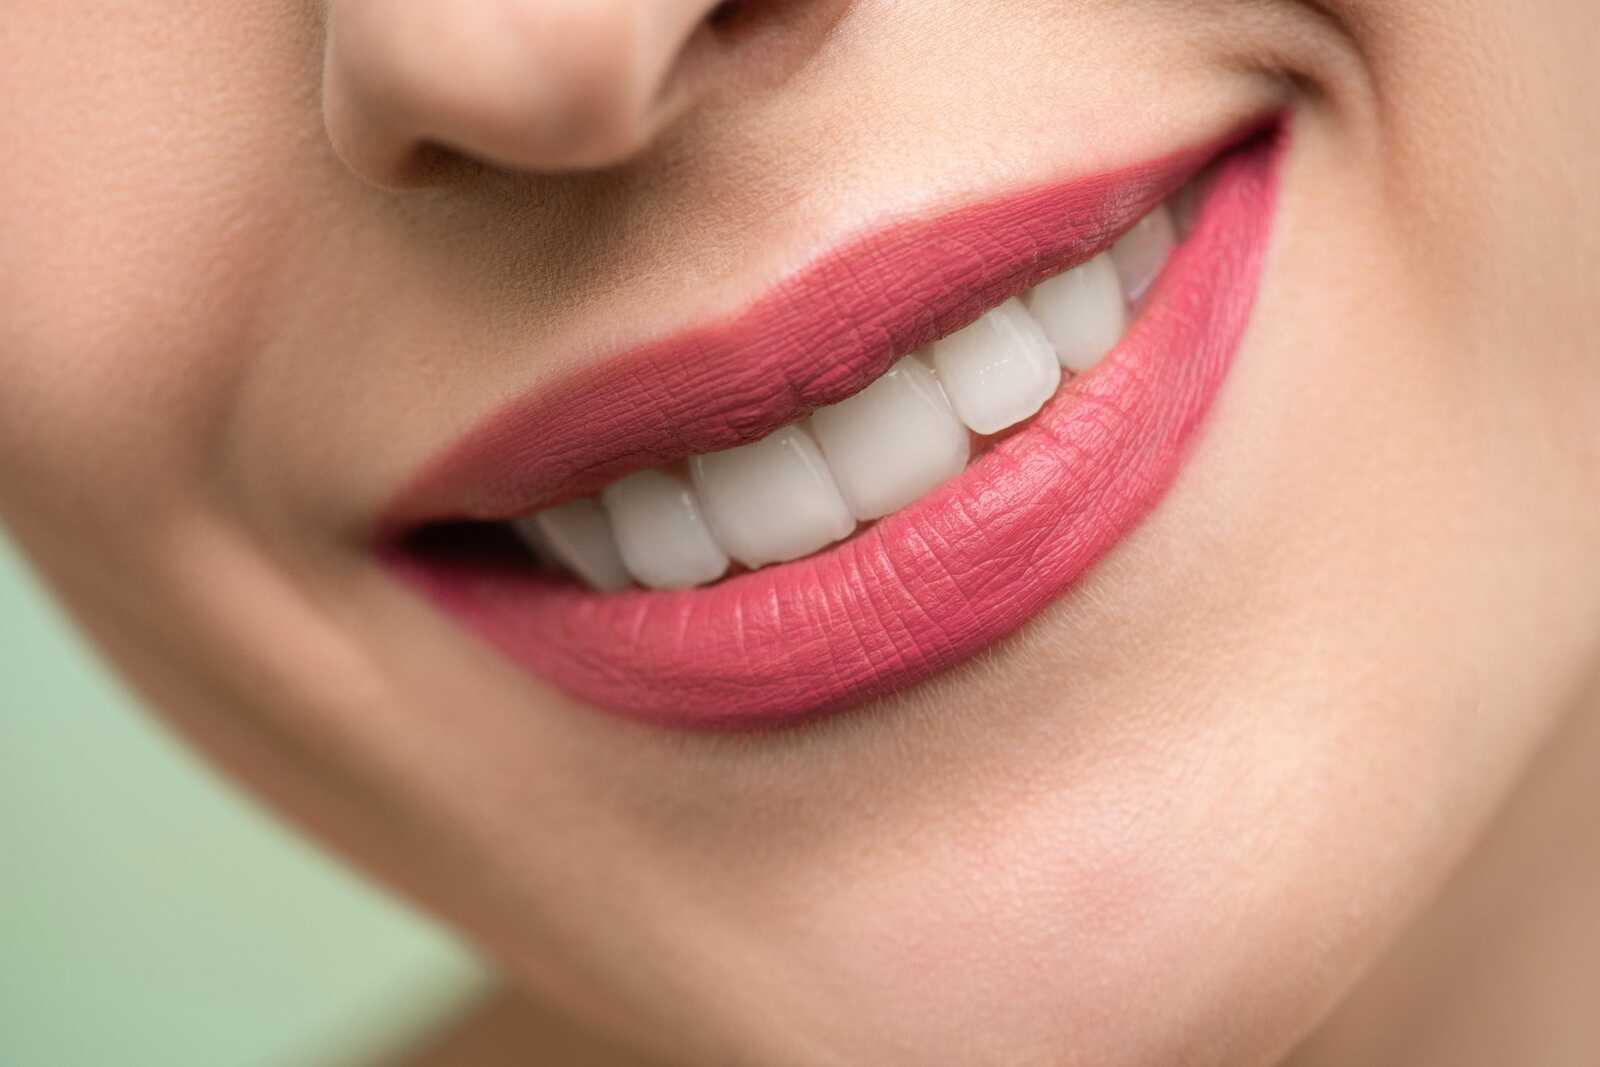 Tandverzorging & mondverzorging